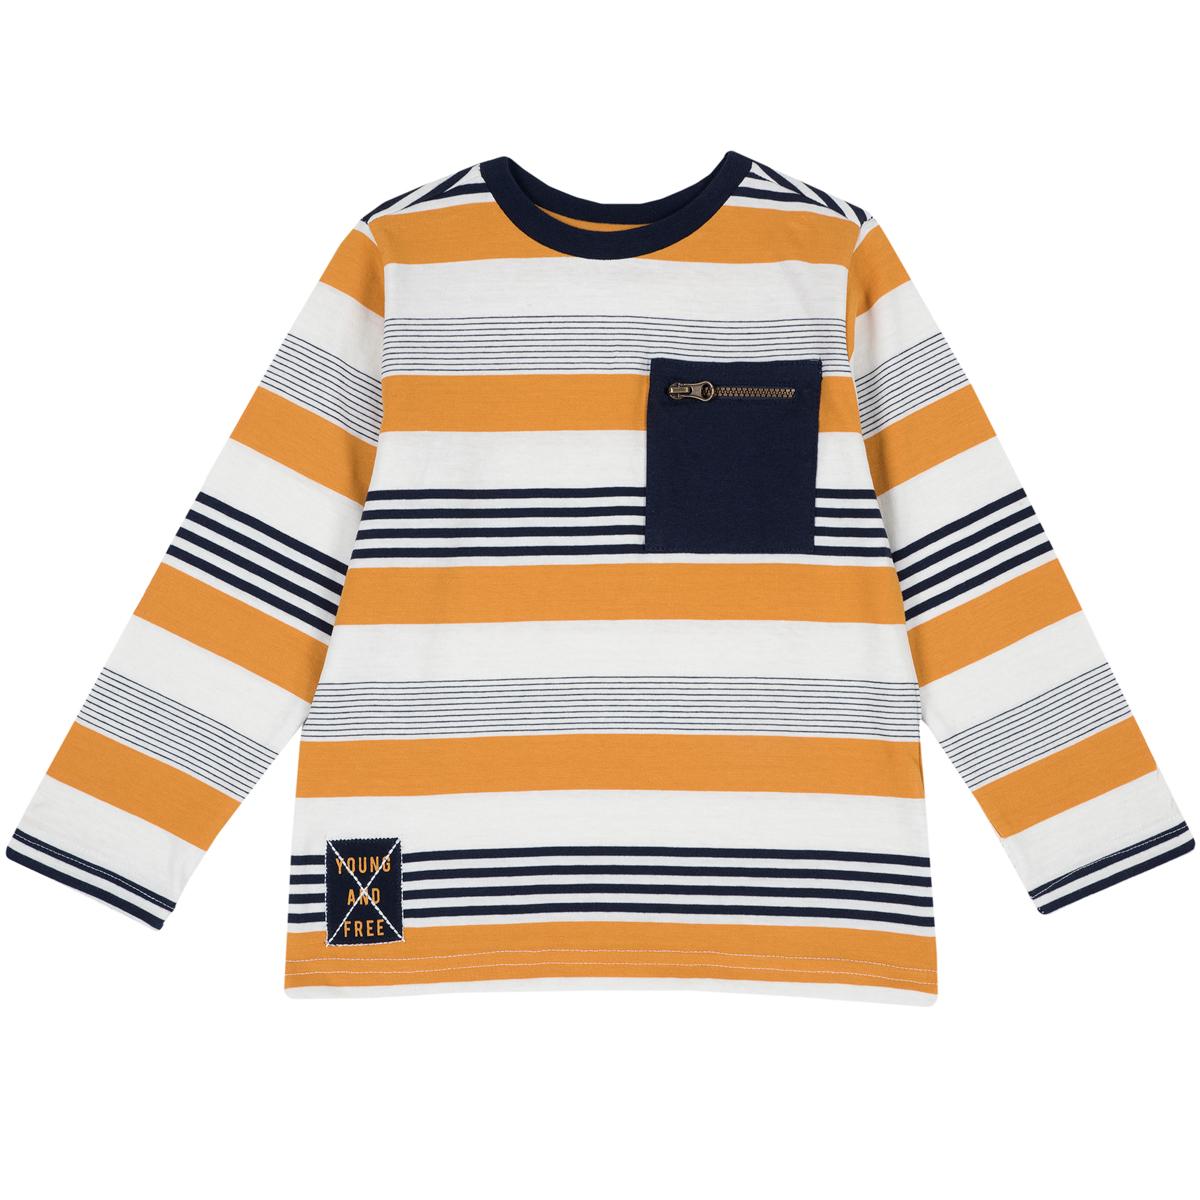 Tricou maneca lunga Chicco, dungi transversale, fermoar aplicat, 06771 din categoria Tricouri copii